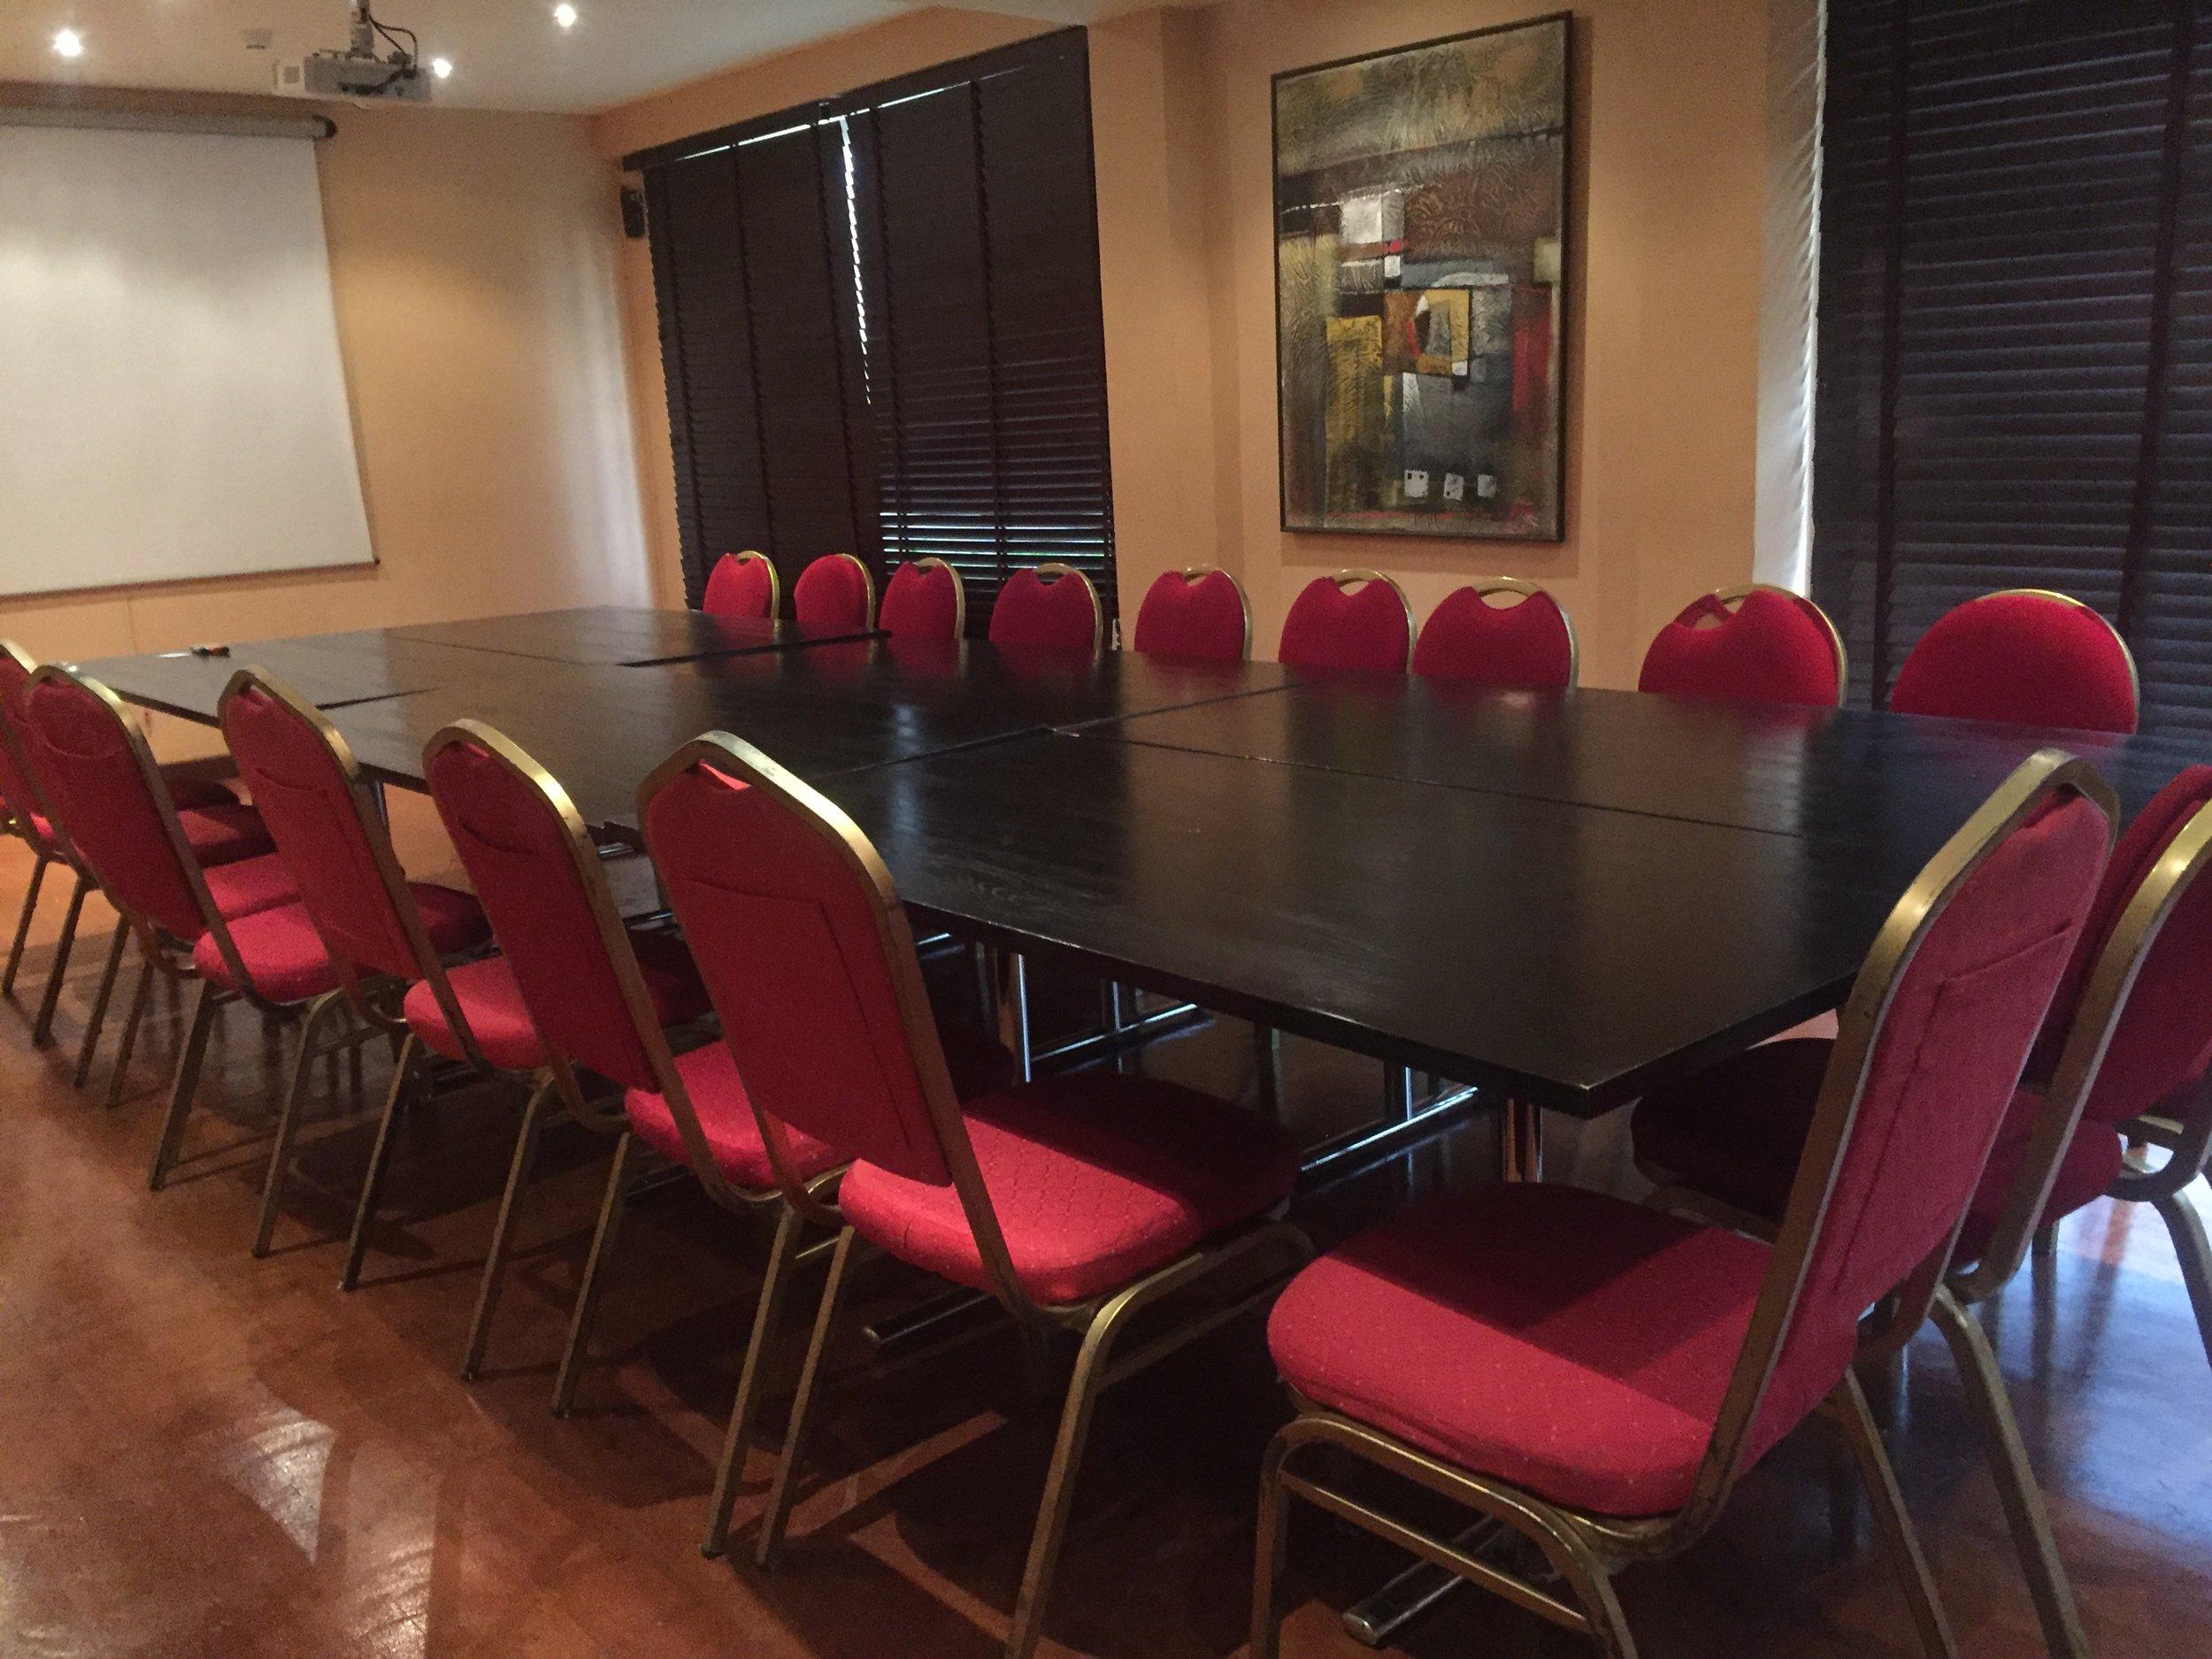 EREKO room with a 25-man sitting capacity